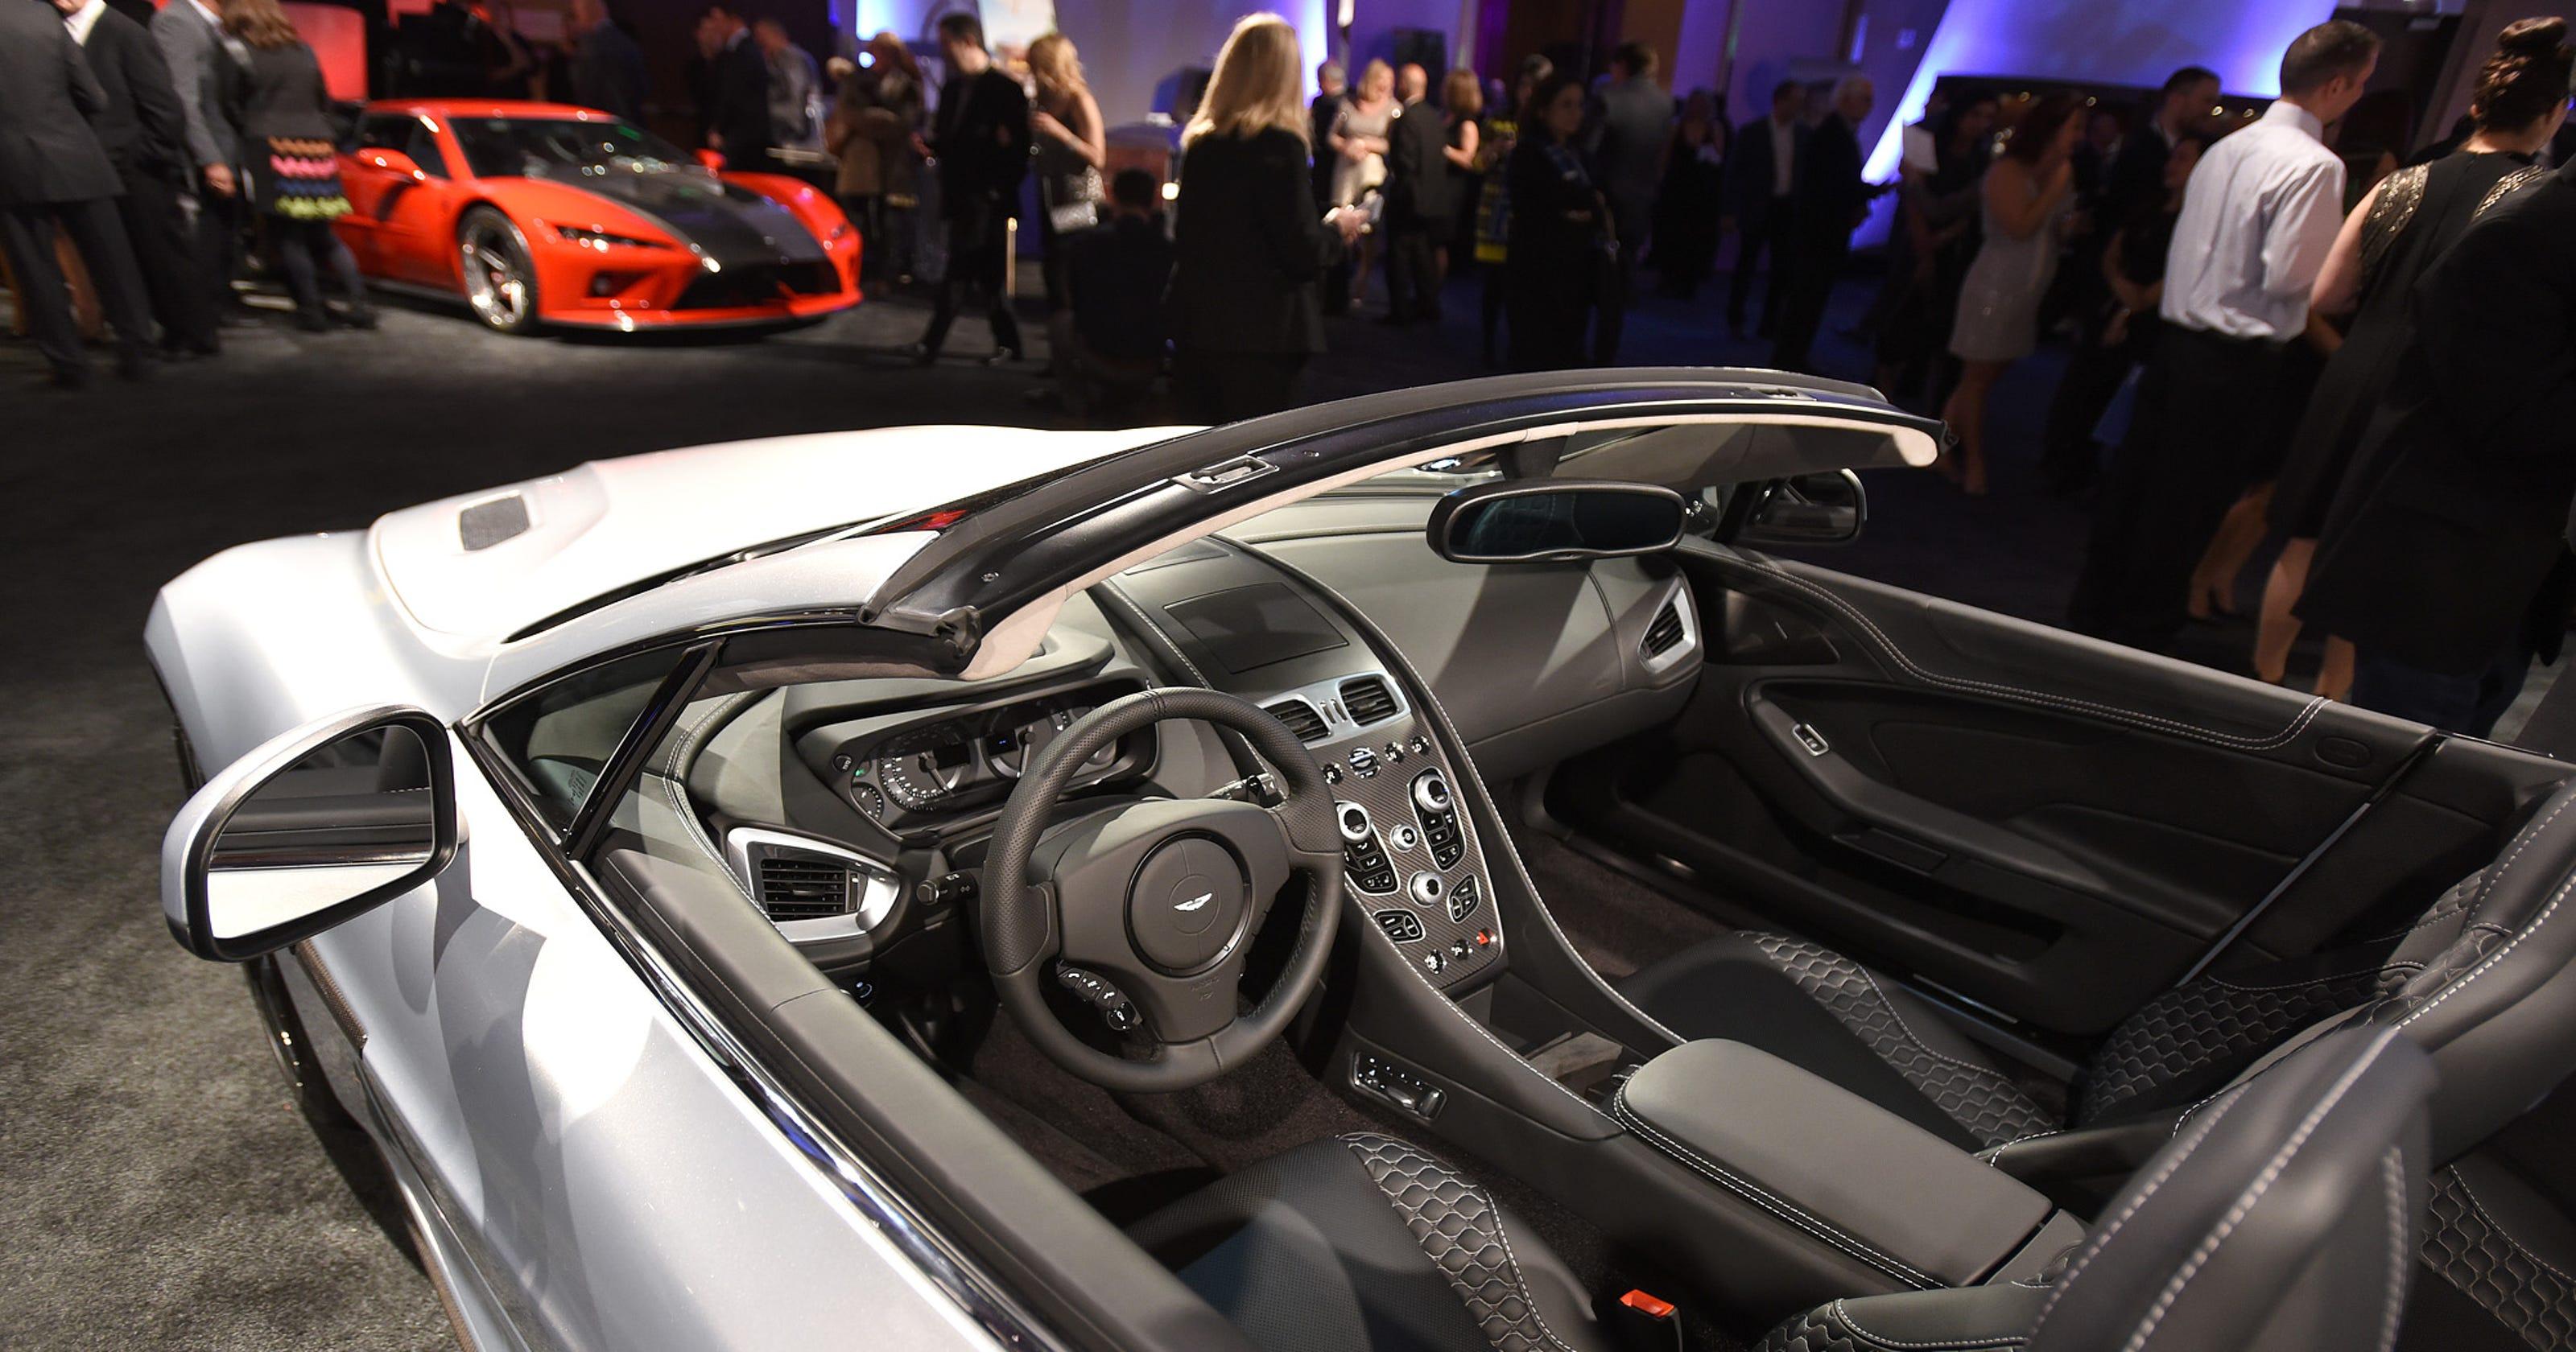 The 2016 Gallery Luxury Auto Event